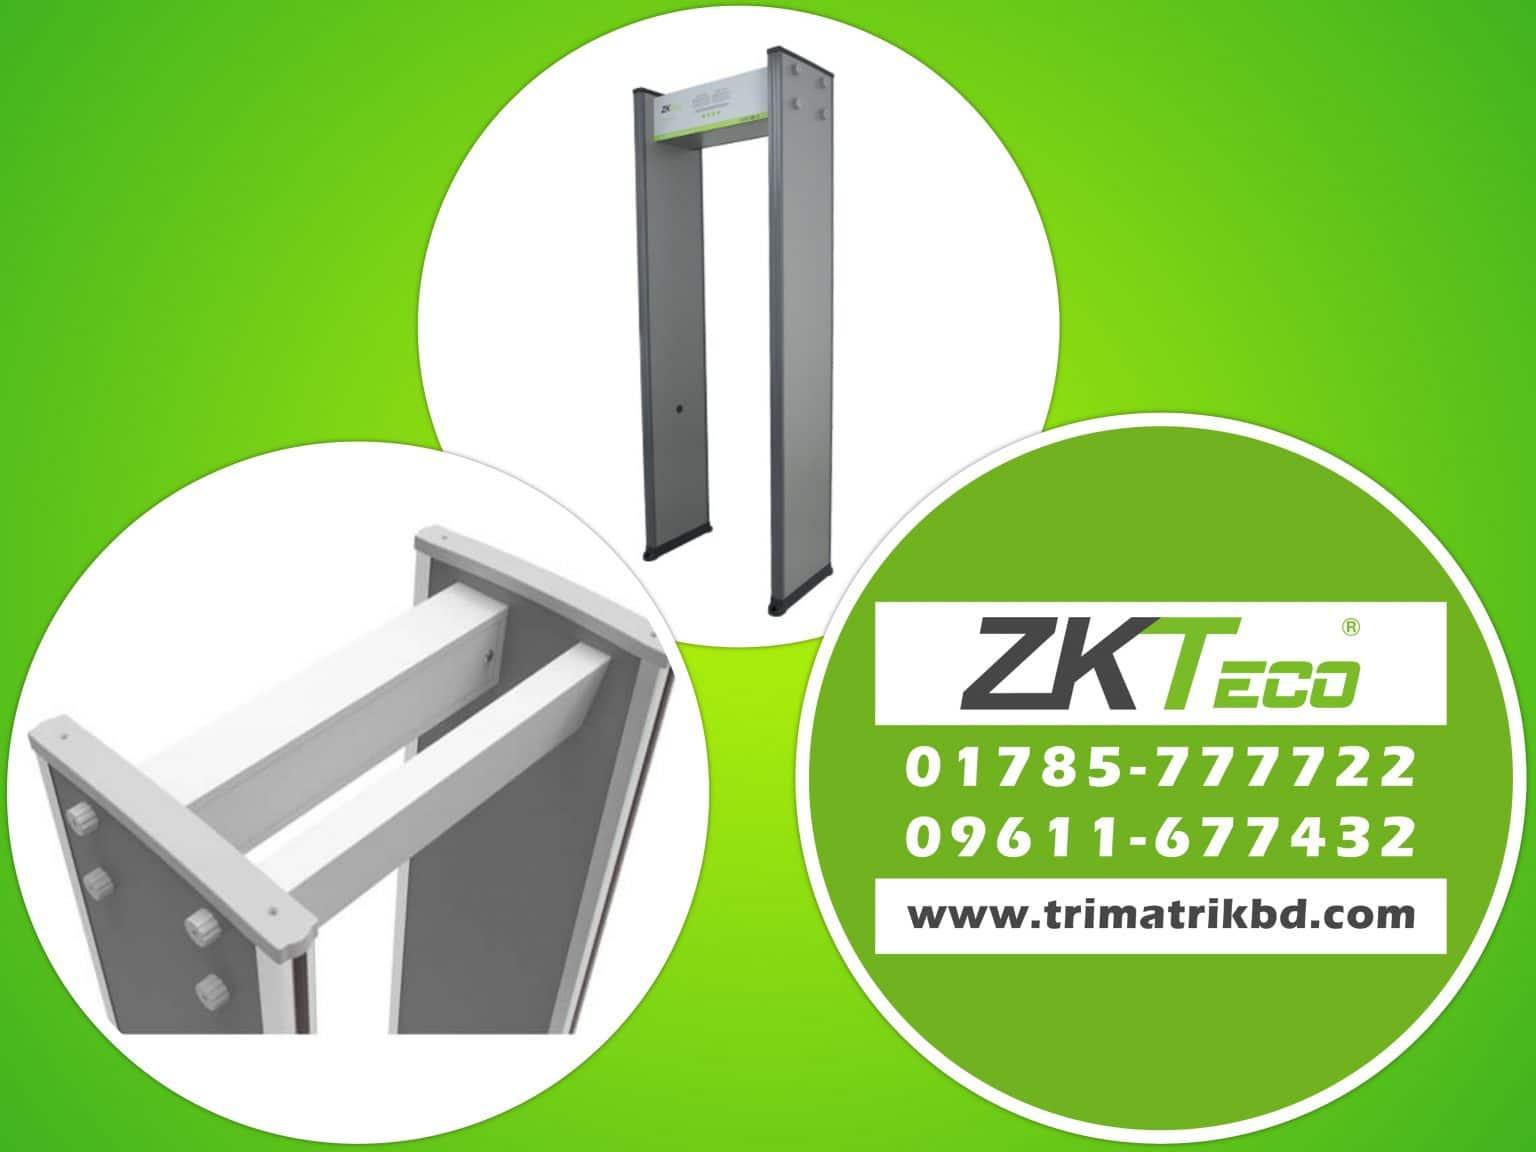 ZKTeco ZK-D1065S Price in Bangladesh